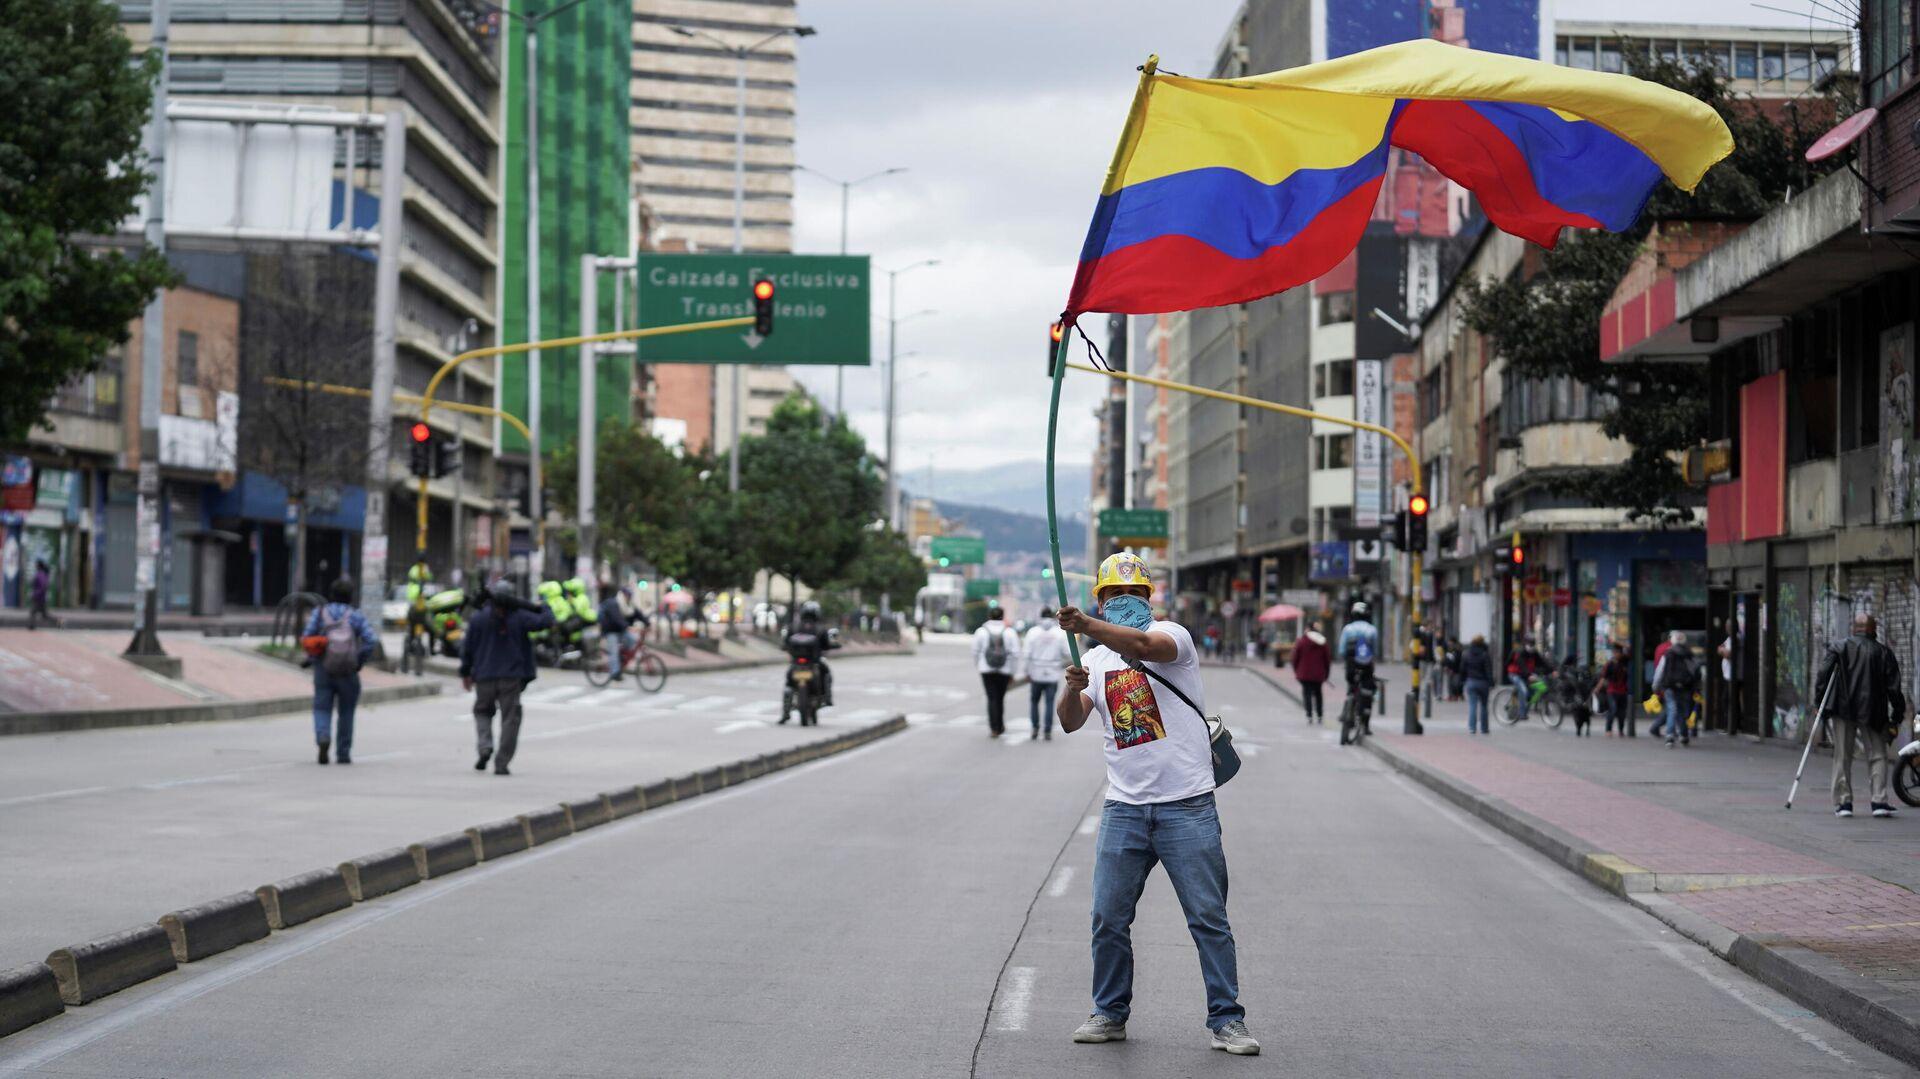 Manifestaciones en Bogotá, Colombia - Sputnik Mundo, 1920, 20.07.2021